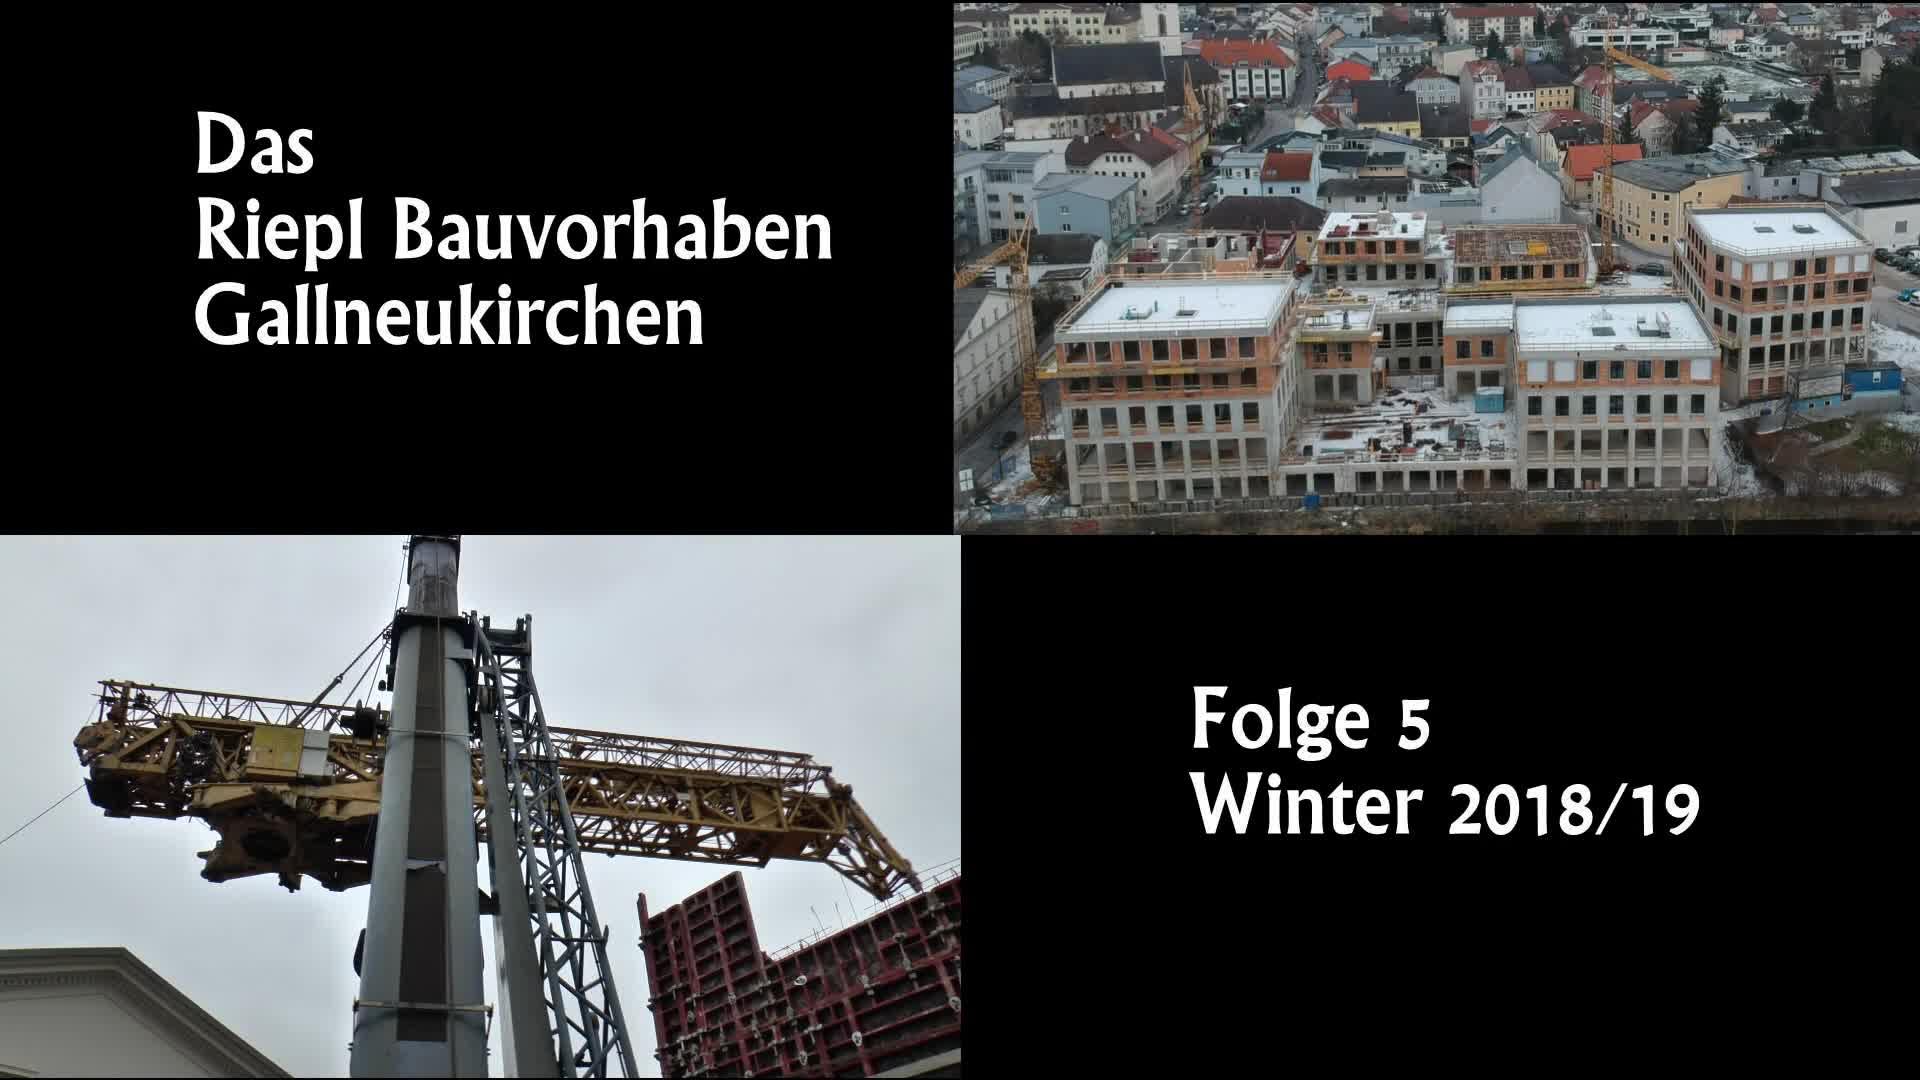 Riepl Baustelle Winter 2018/19 Folge 5